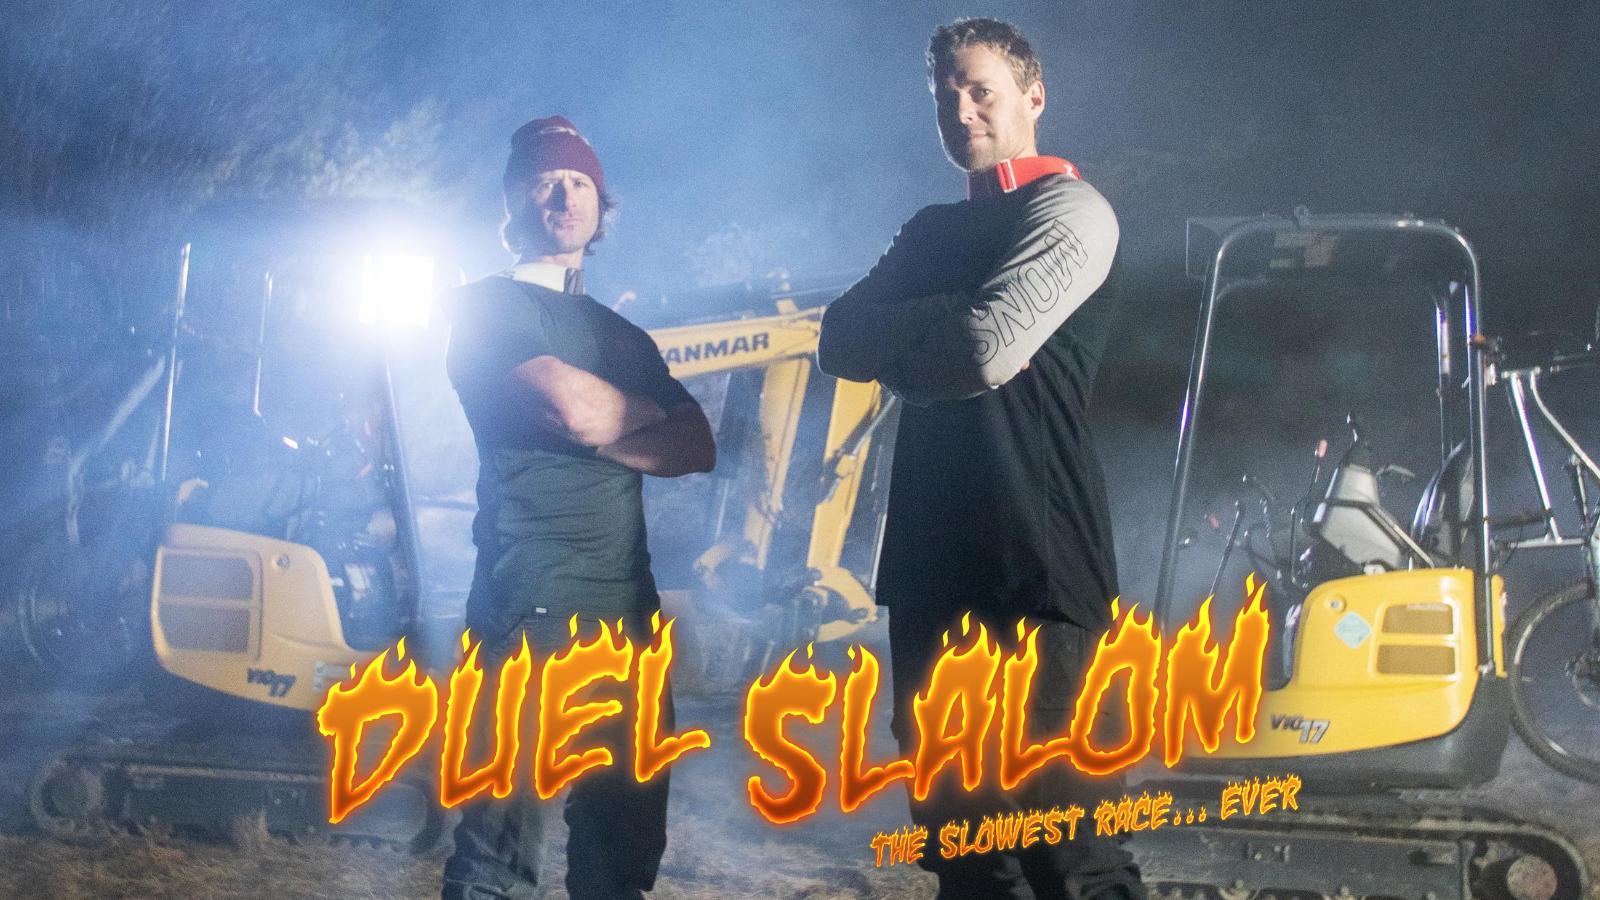 Dual Slalom promotion